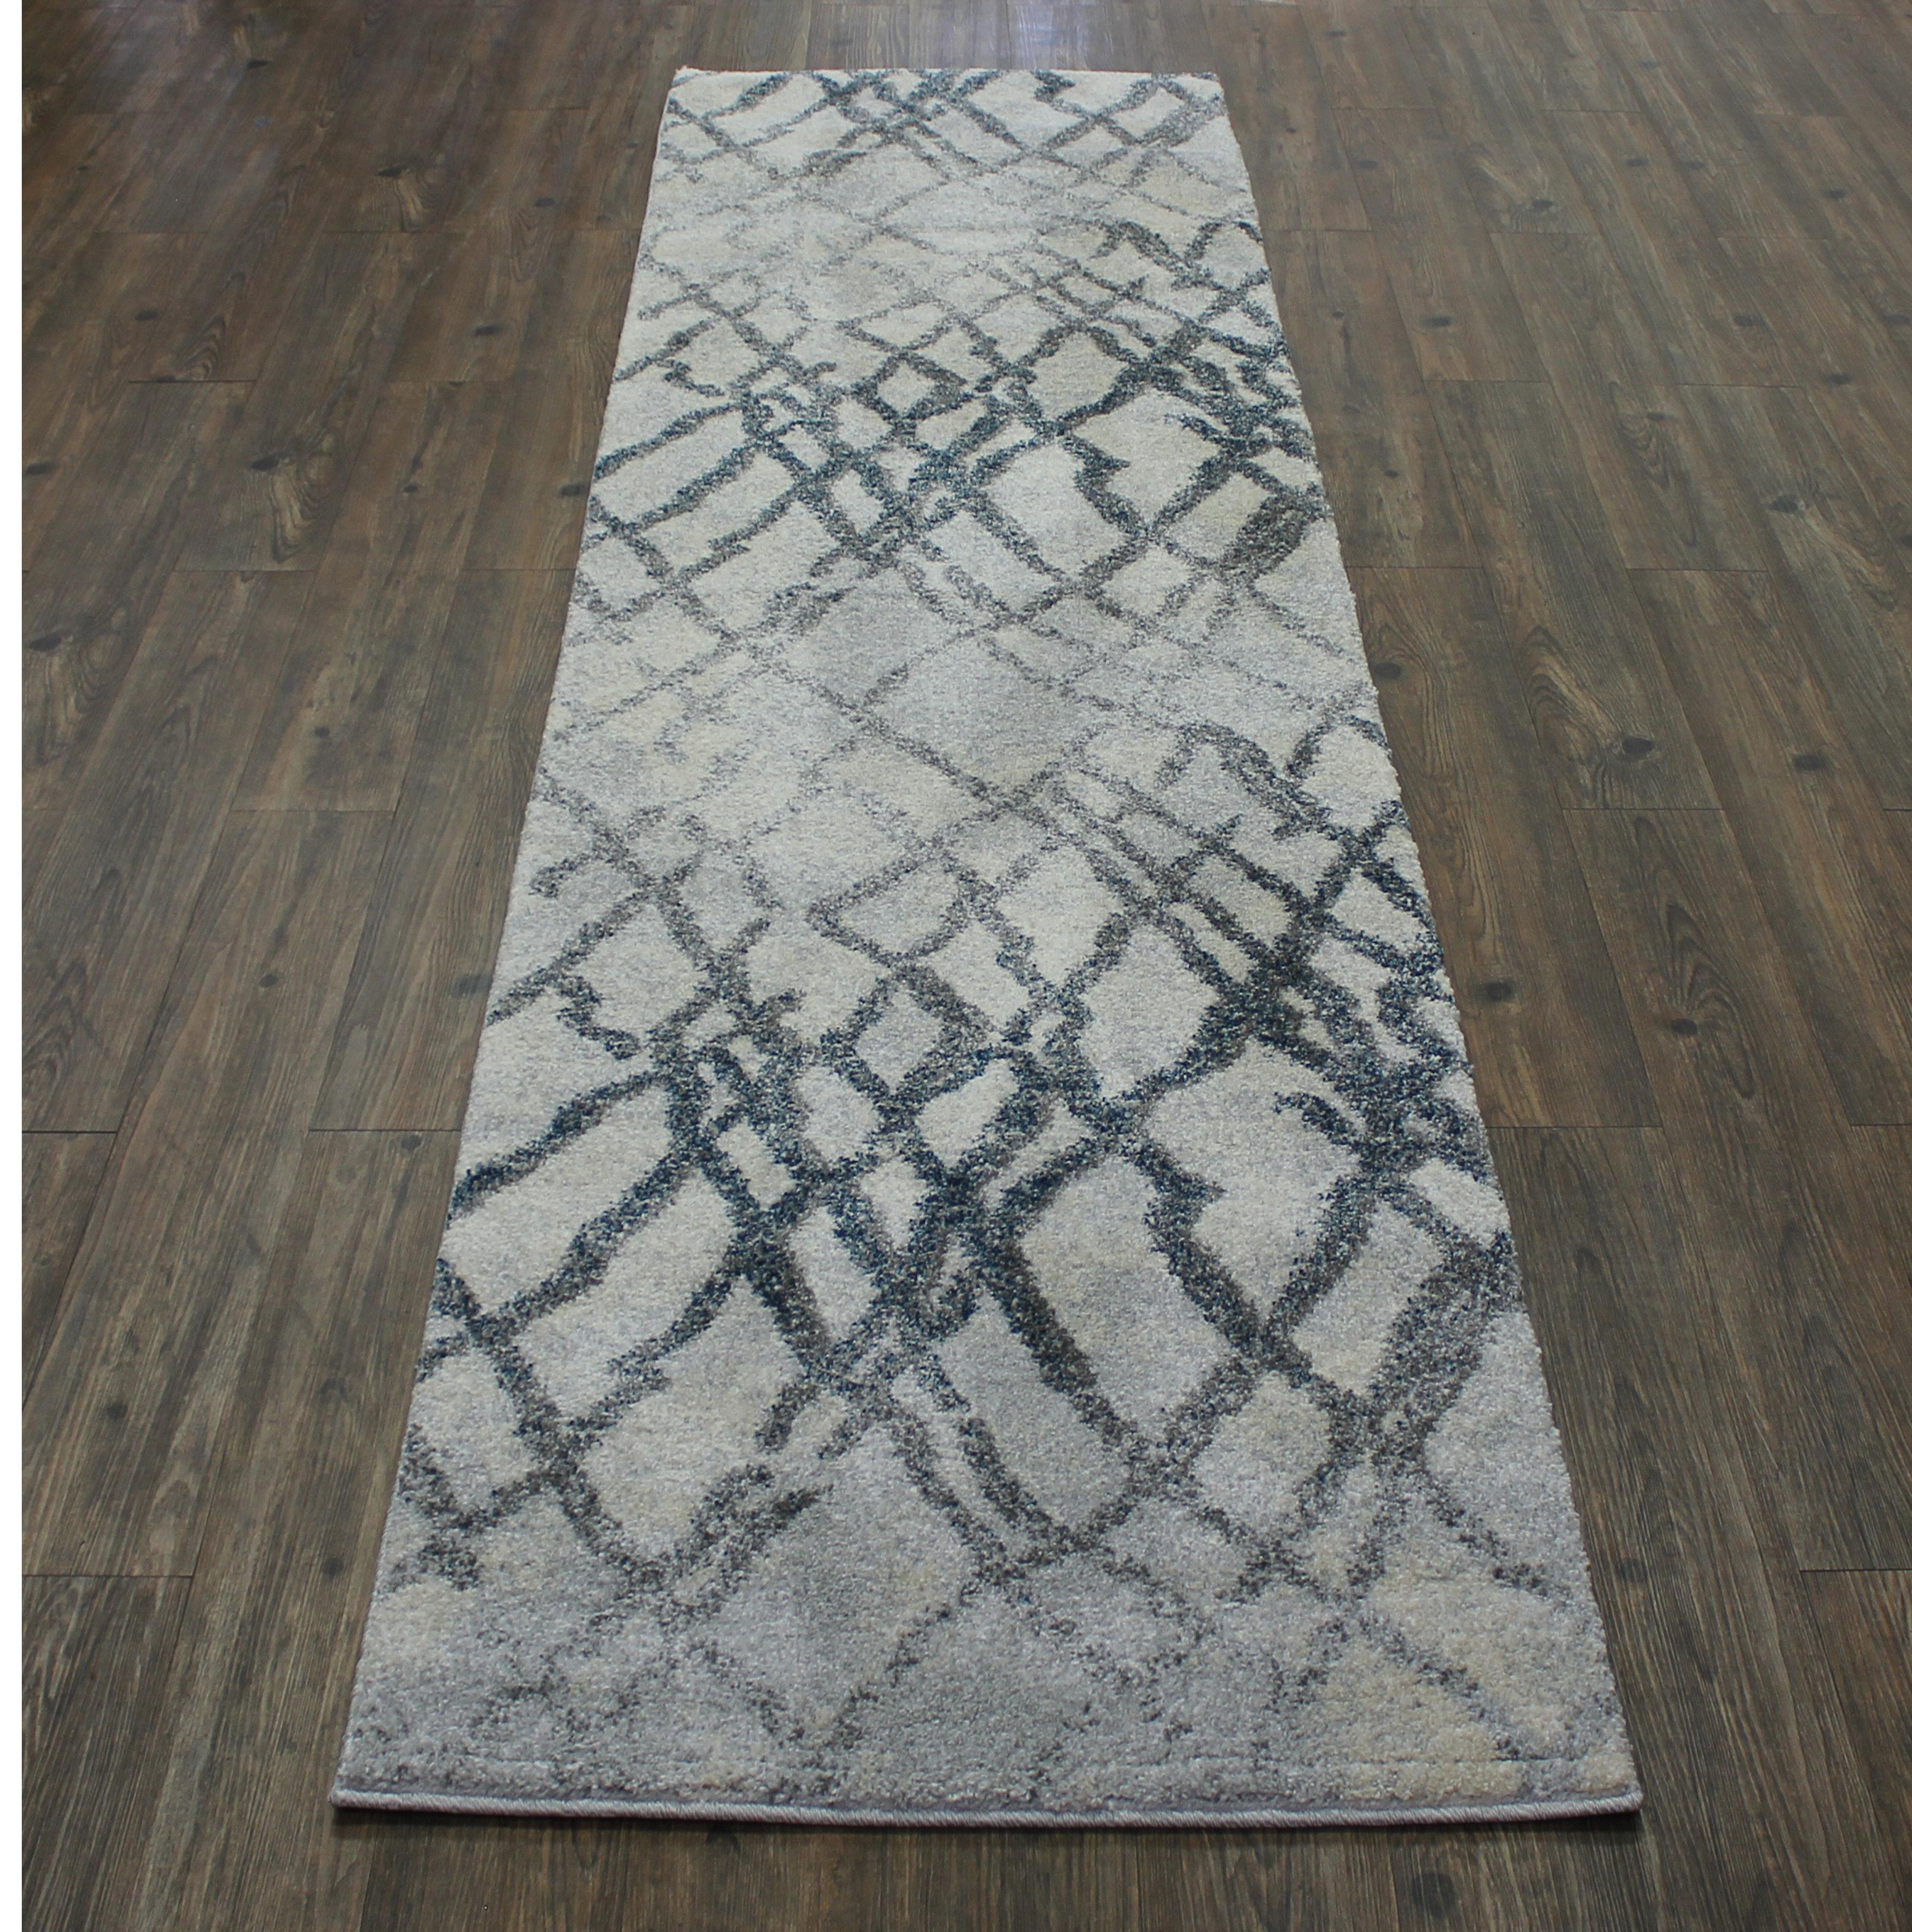 Hallway Runner Rug Grey Silver Tan 100 Polypropylene Made In Turkey